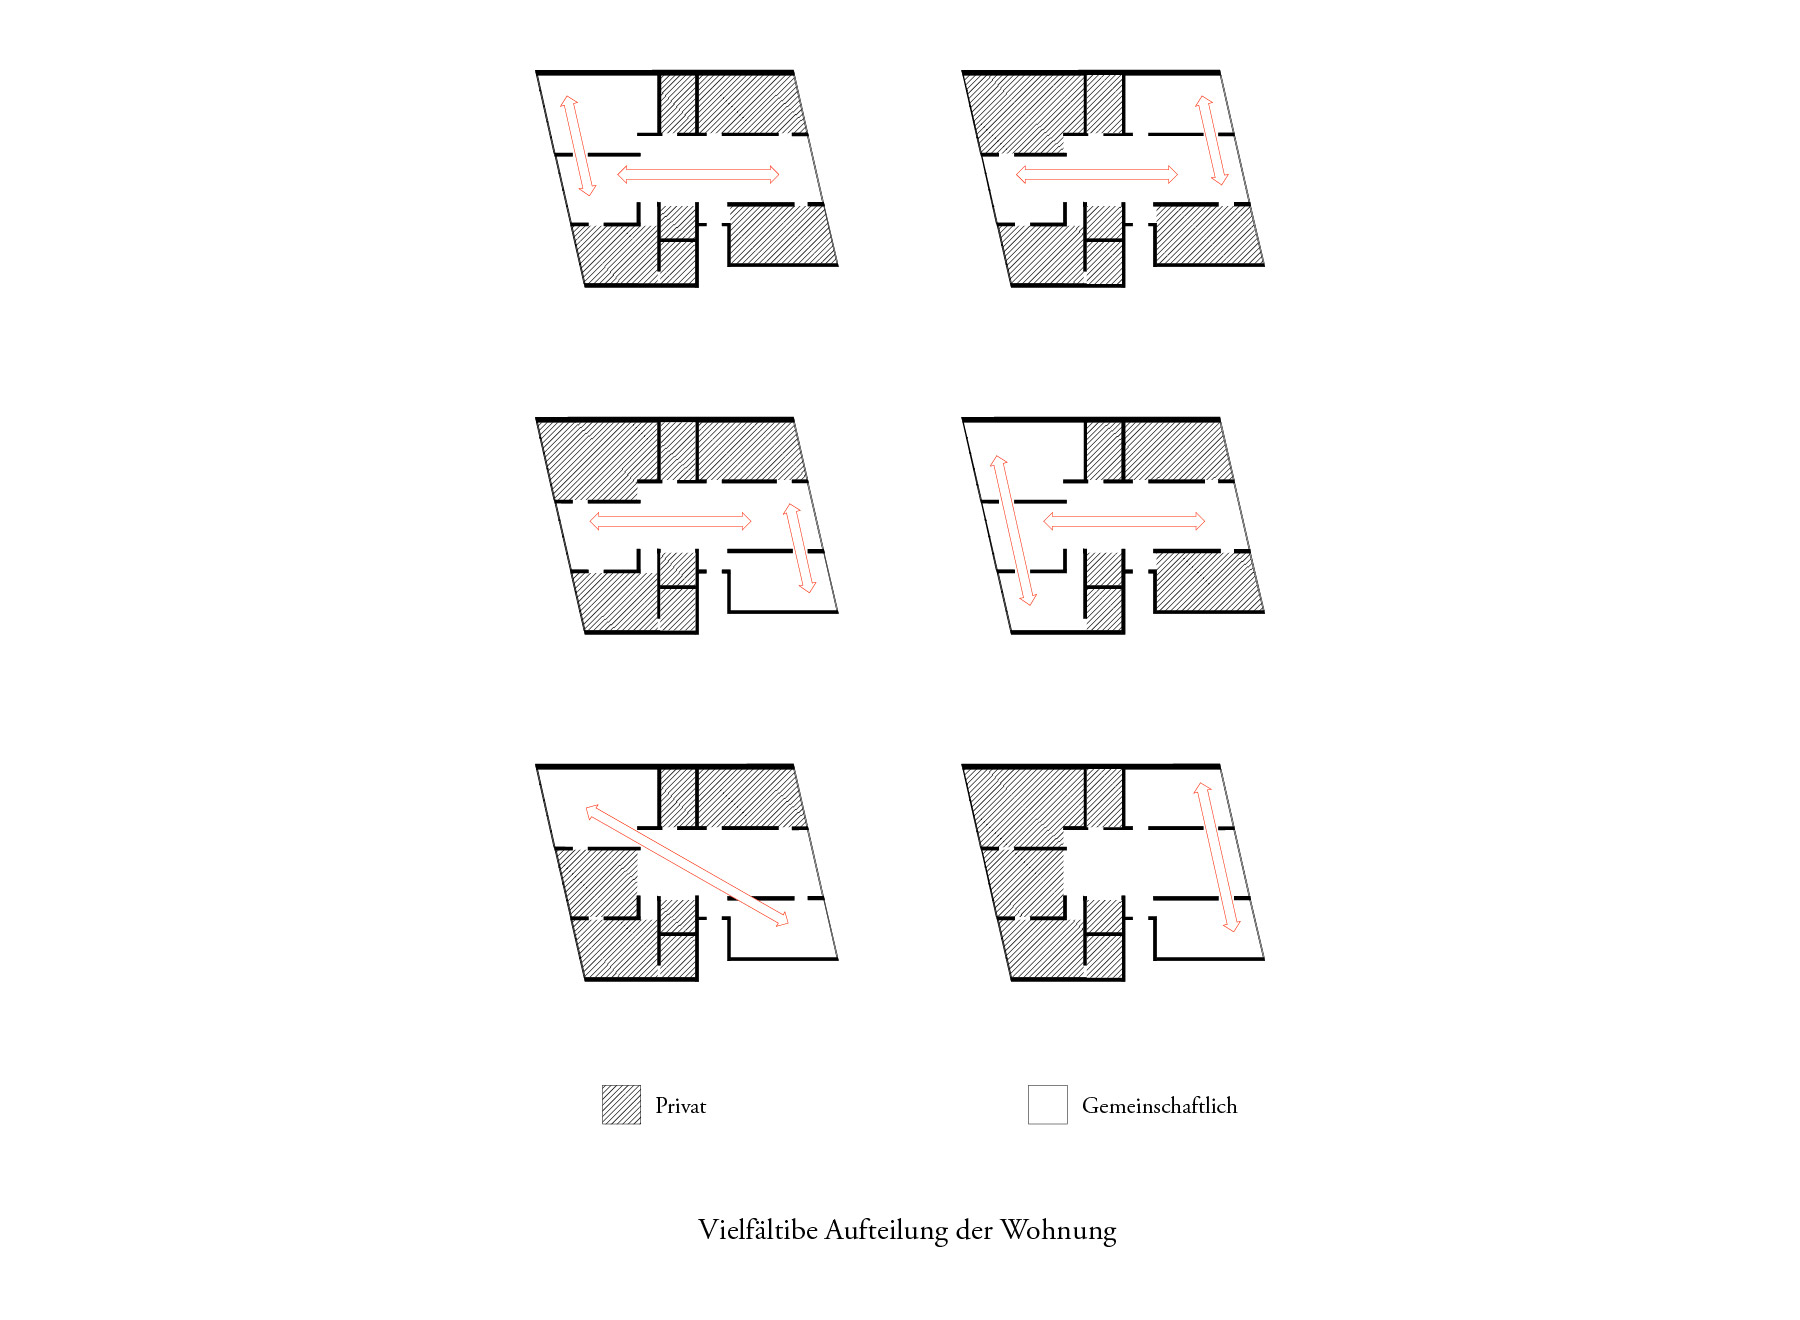 flexibility of usage